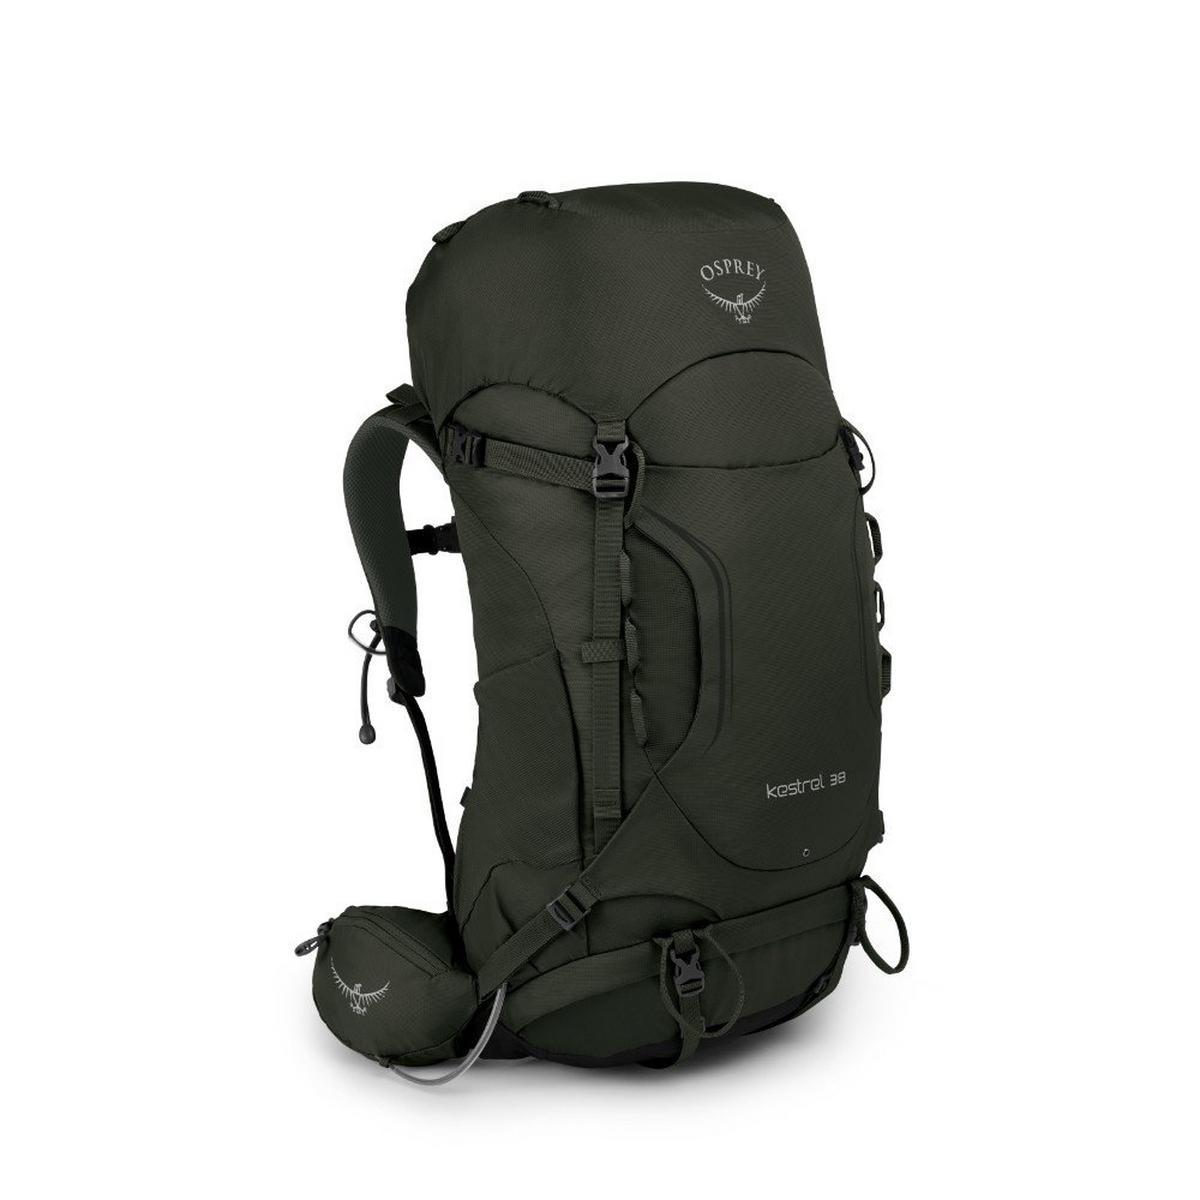 Osprey Packs Kestrel 38 Rucksack Picholine Green (Size M-L)